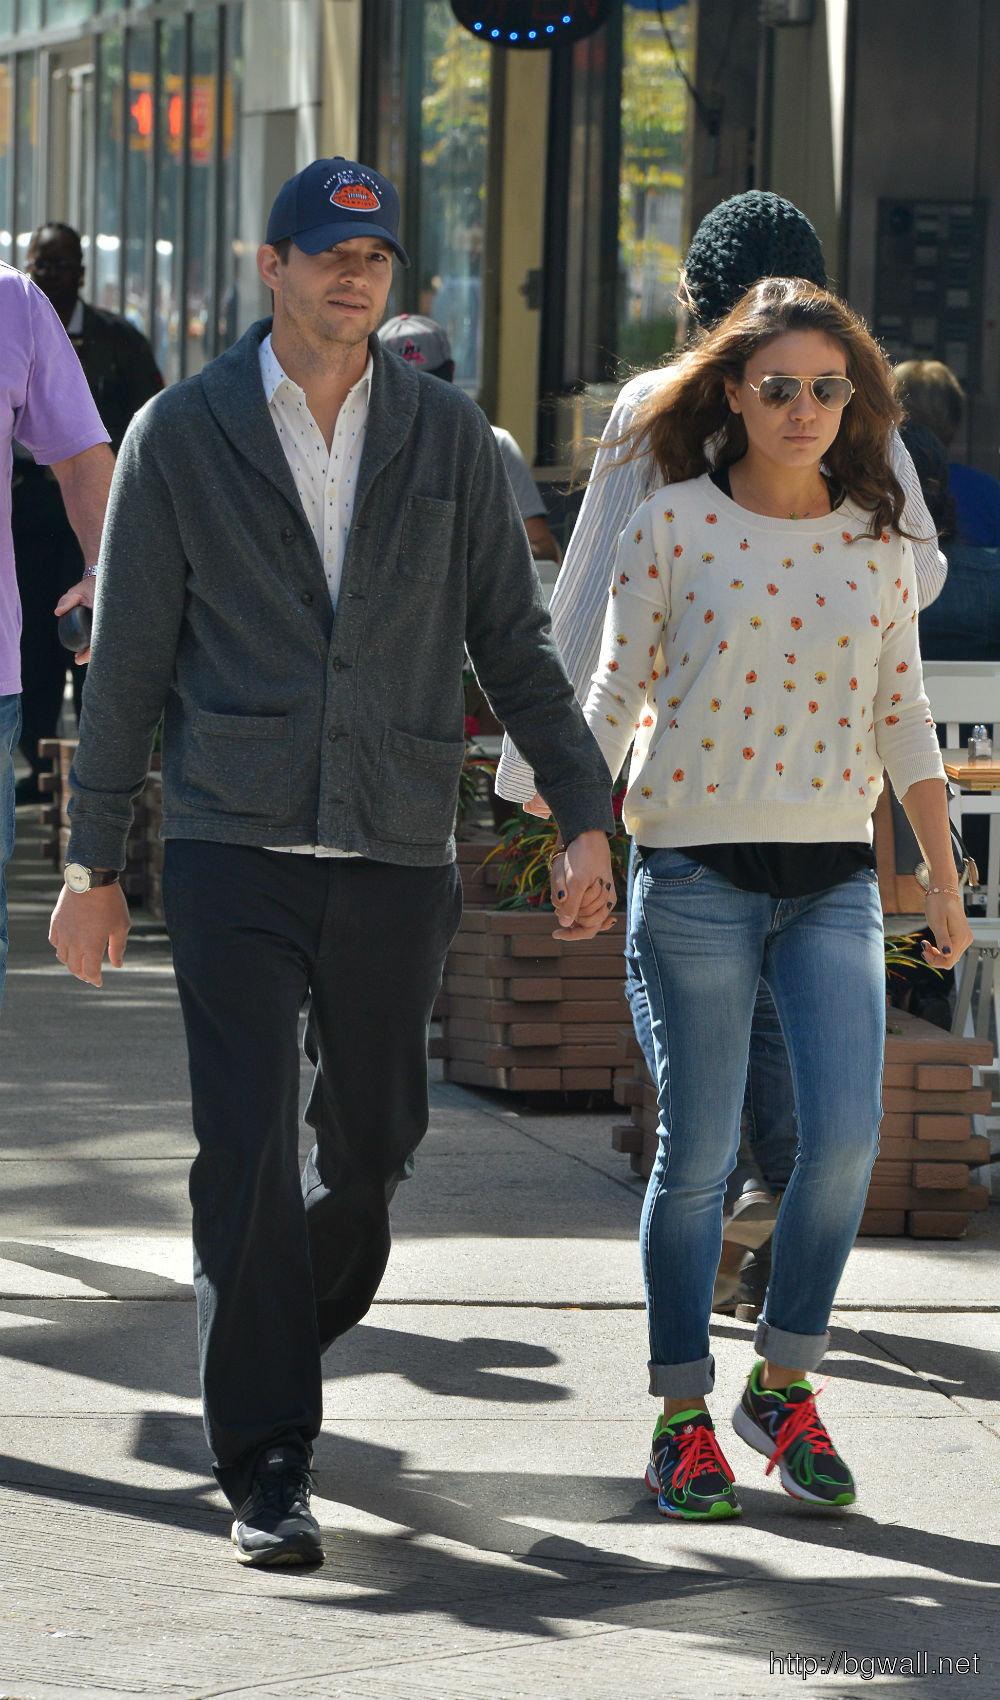 Will It Be Wedding Bells Next Mila Kunis Spending Christmas With Ashton Kutchers Family Full Size